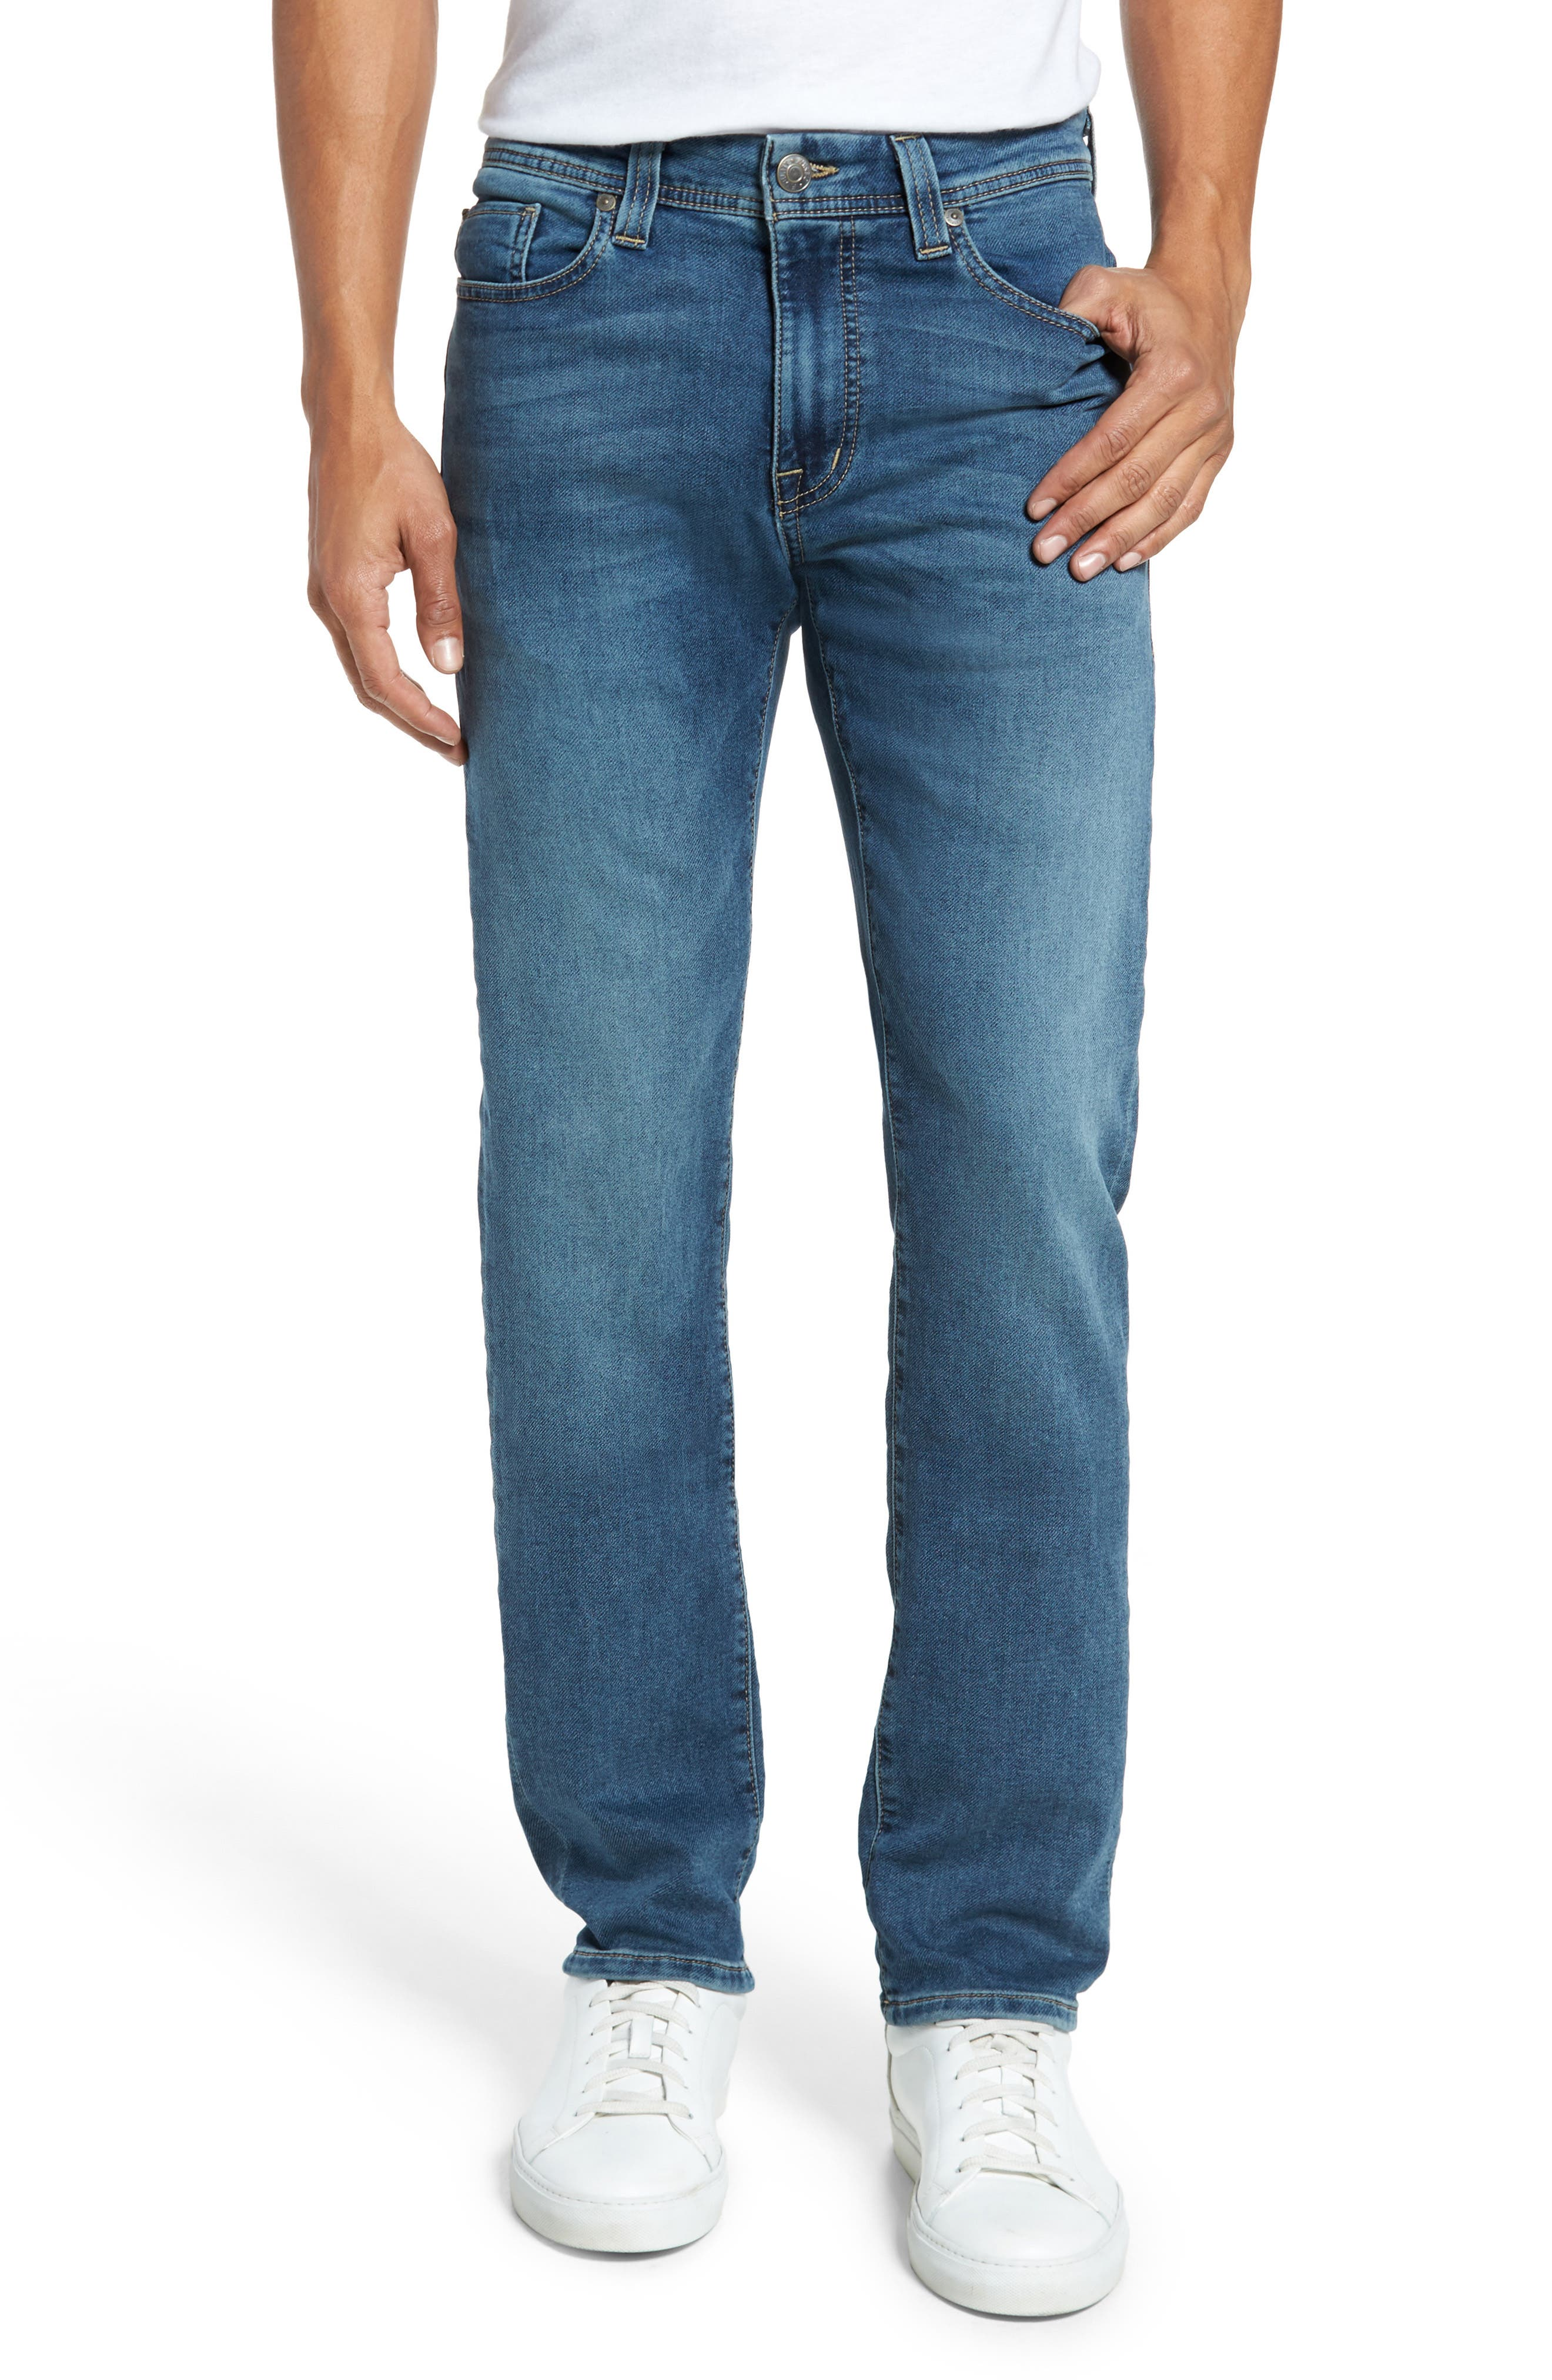 Fidelity Denim Torino Slim Fit Jeans (Vox Vintage)